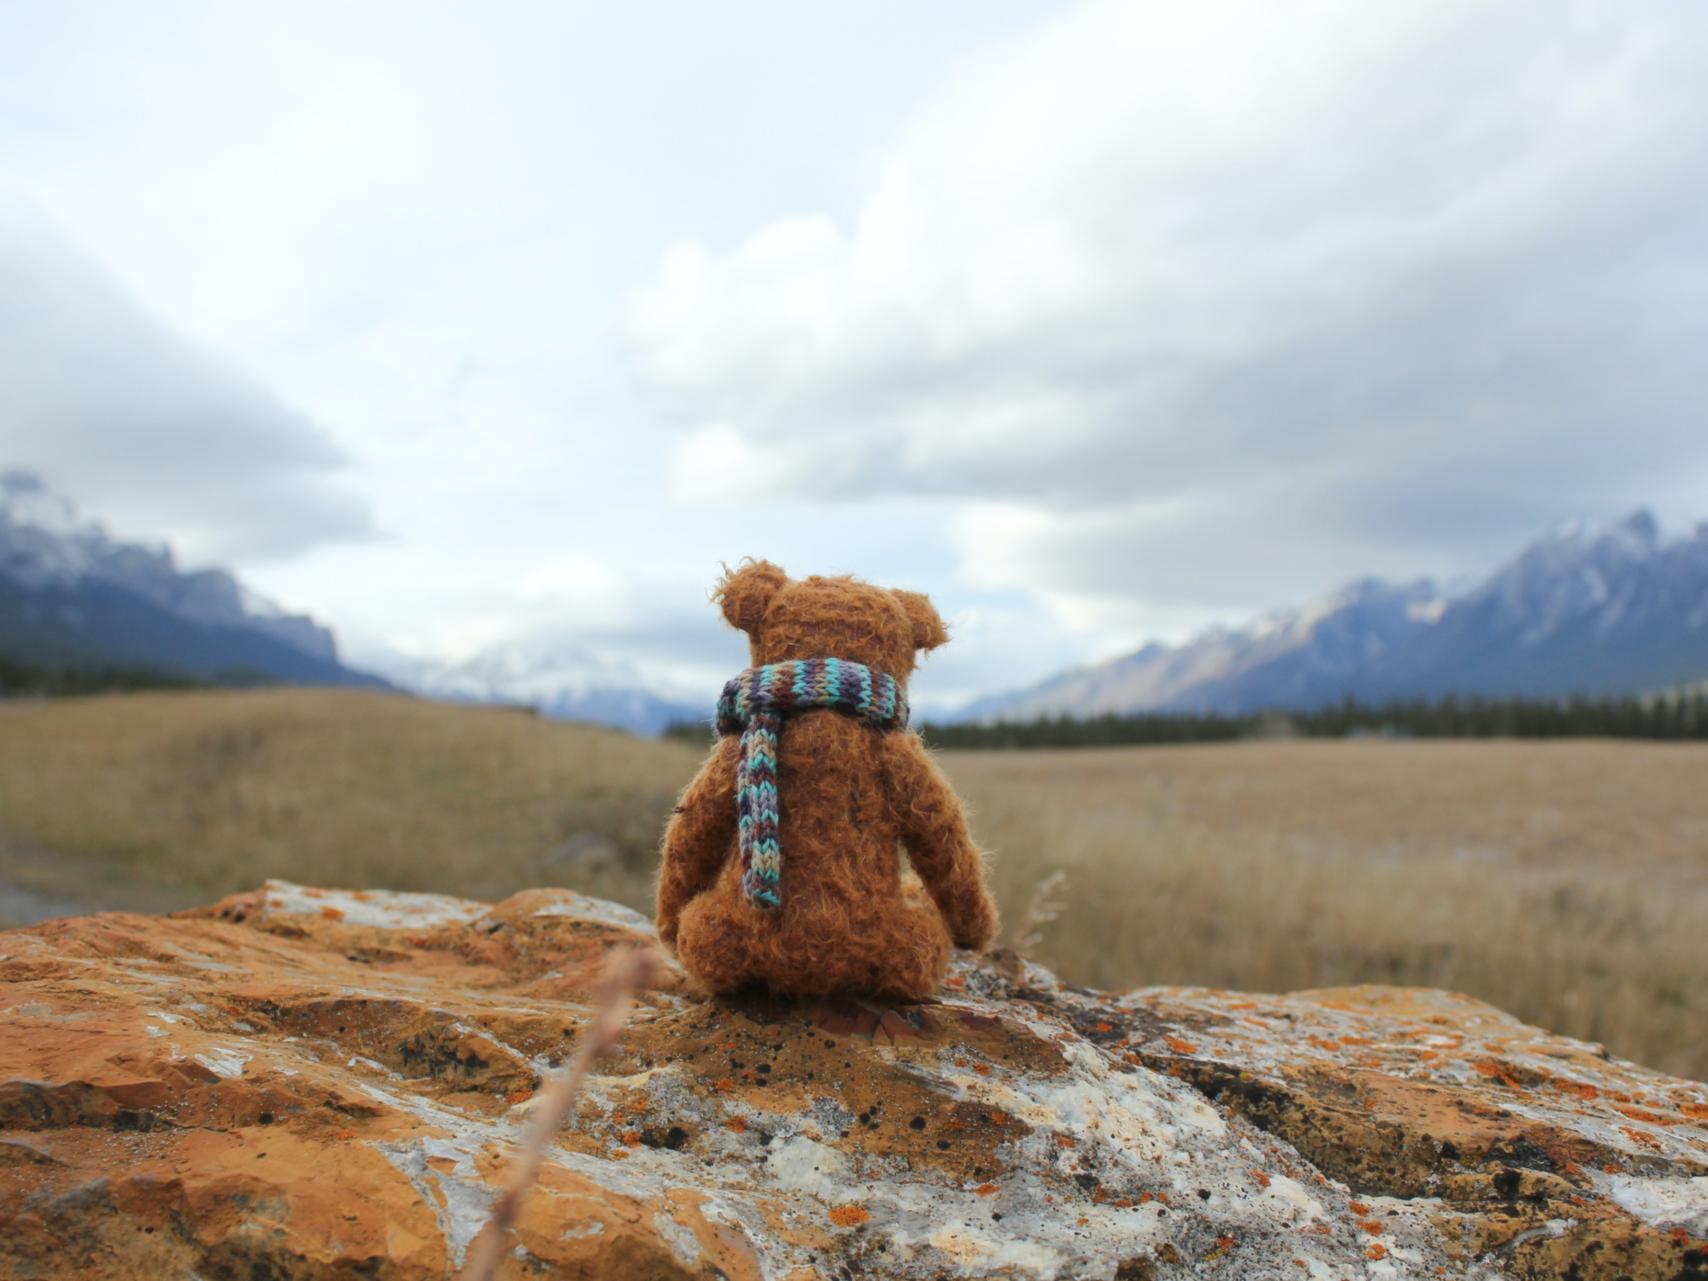 Teddy (c) https://www.instagram.com/kjesommerfreizeit/